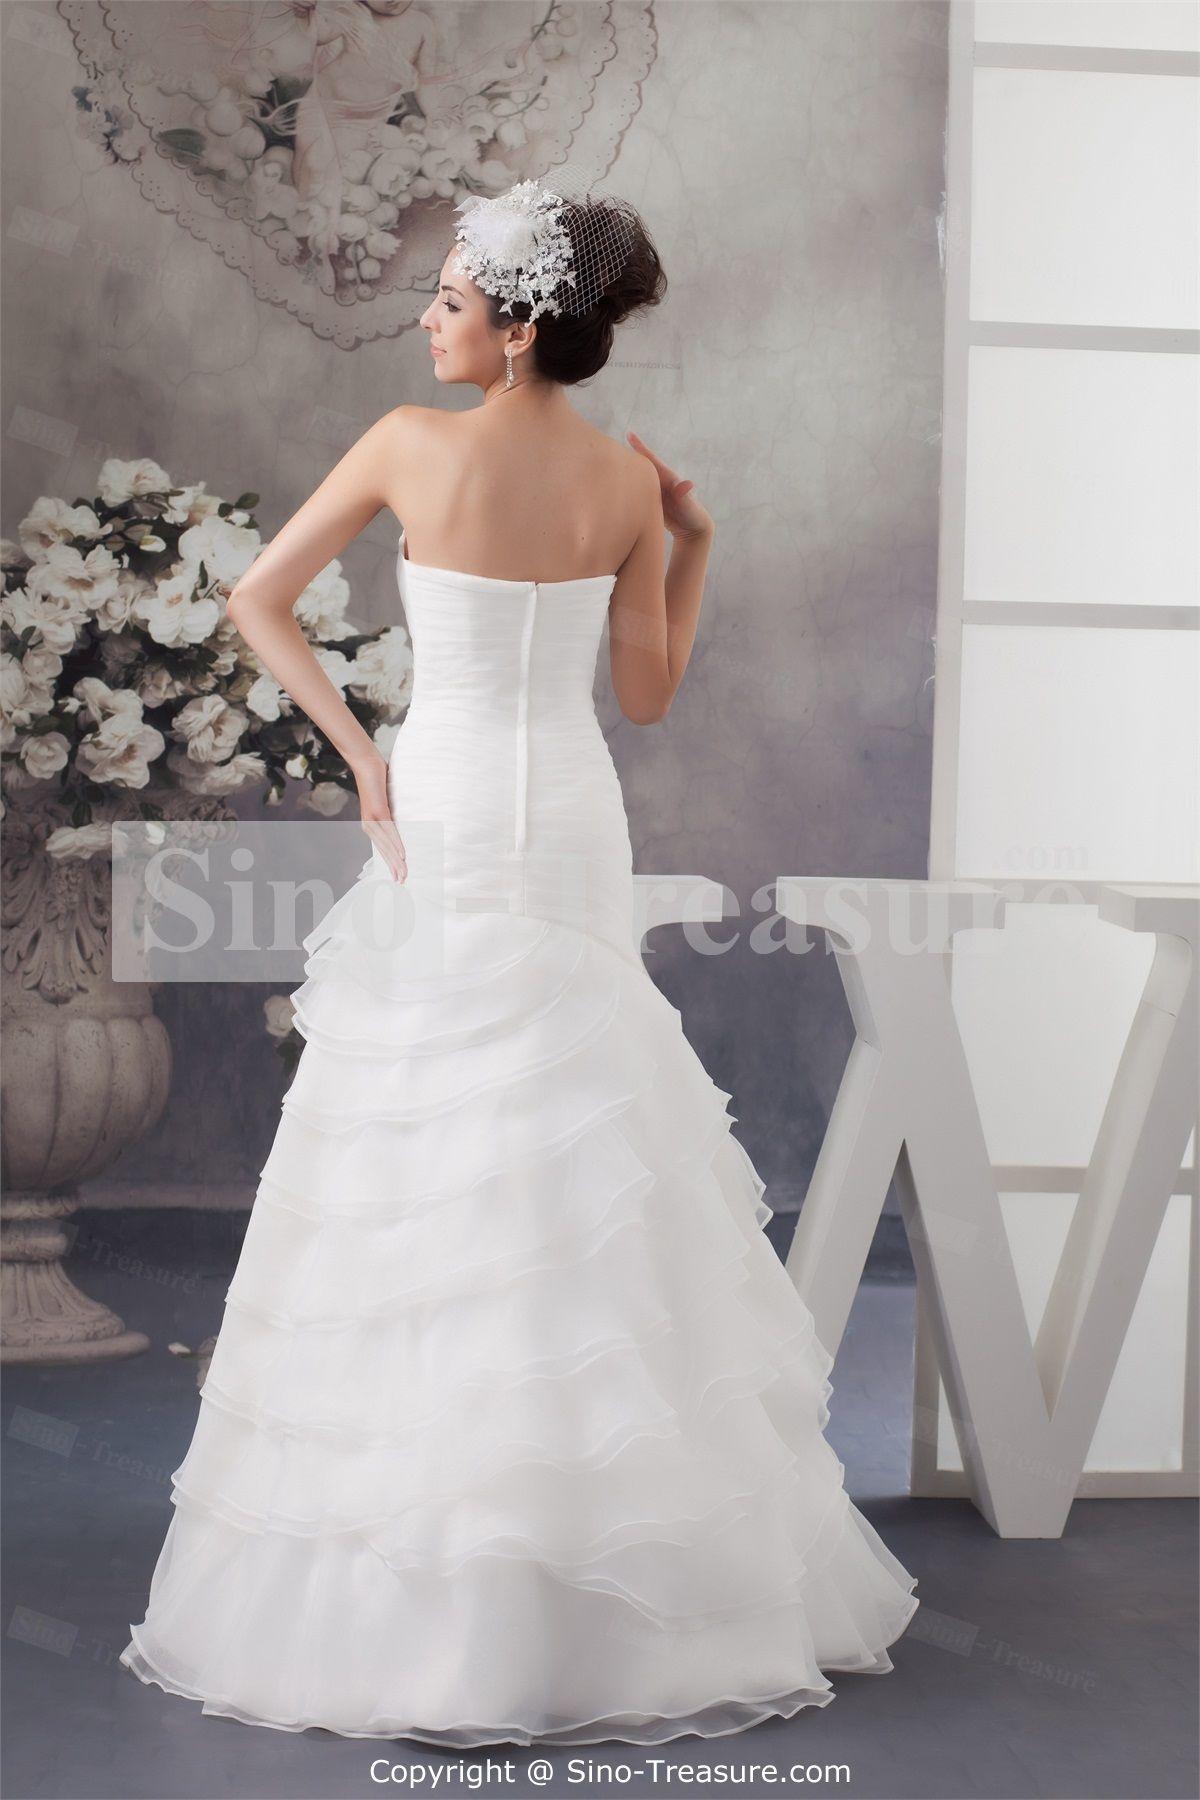 White aline natural brush sweep train sweetheart wedding dress